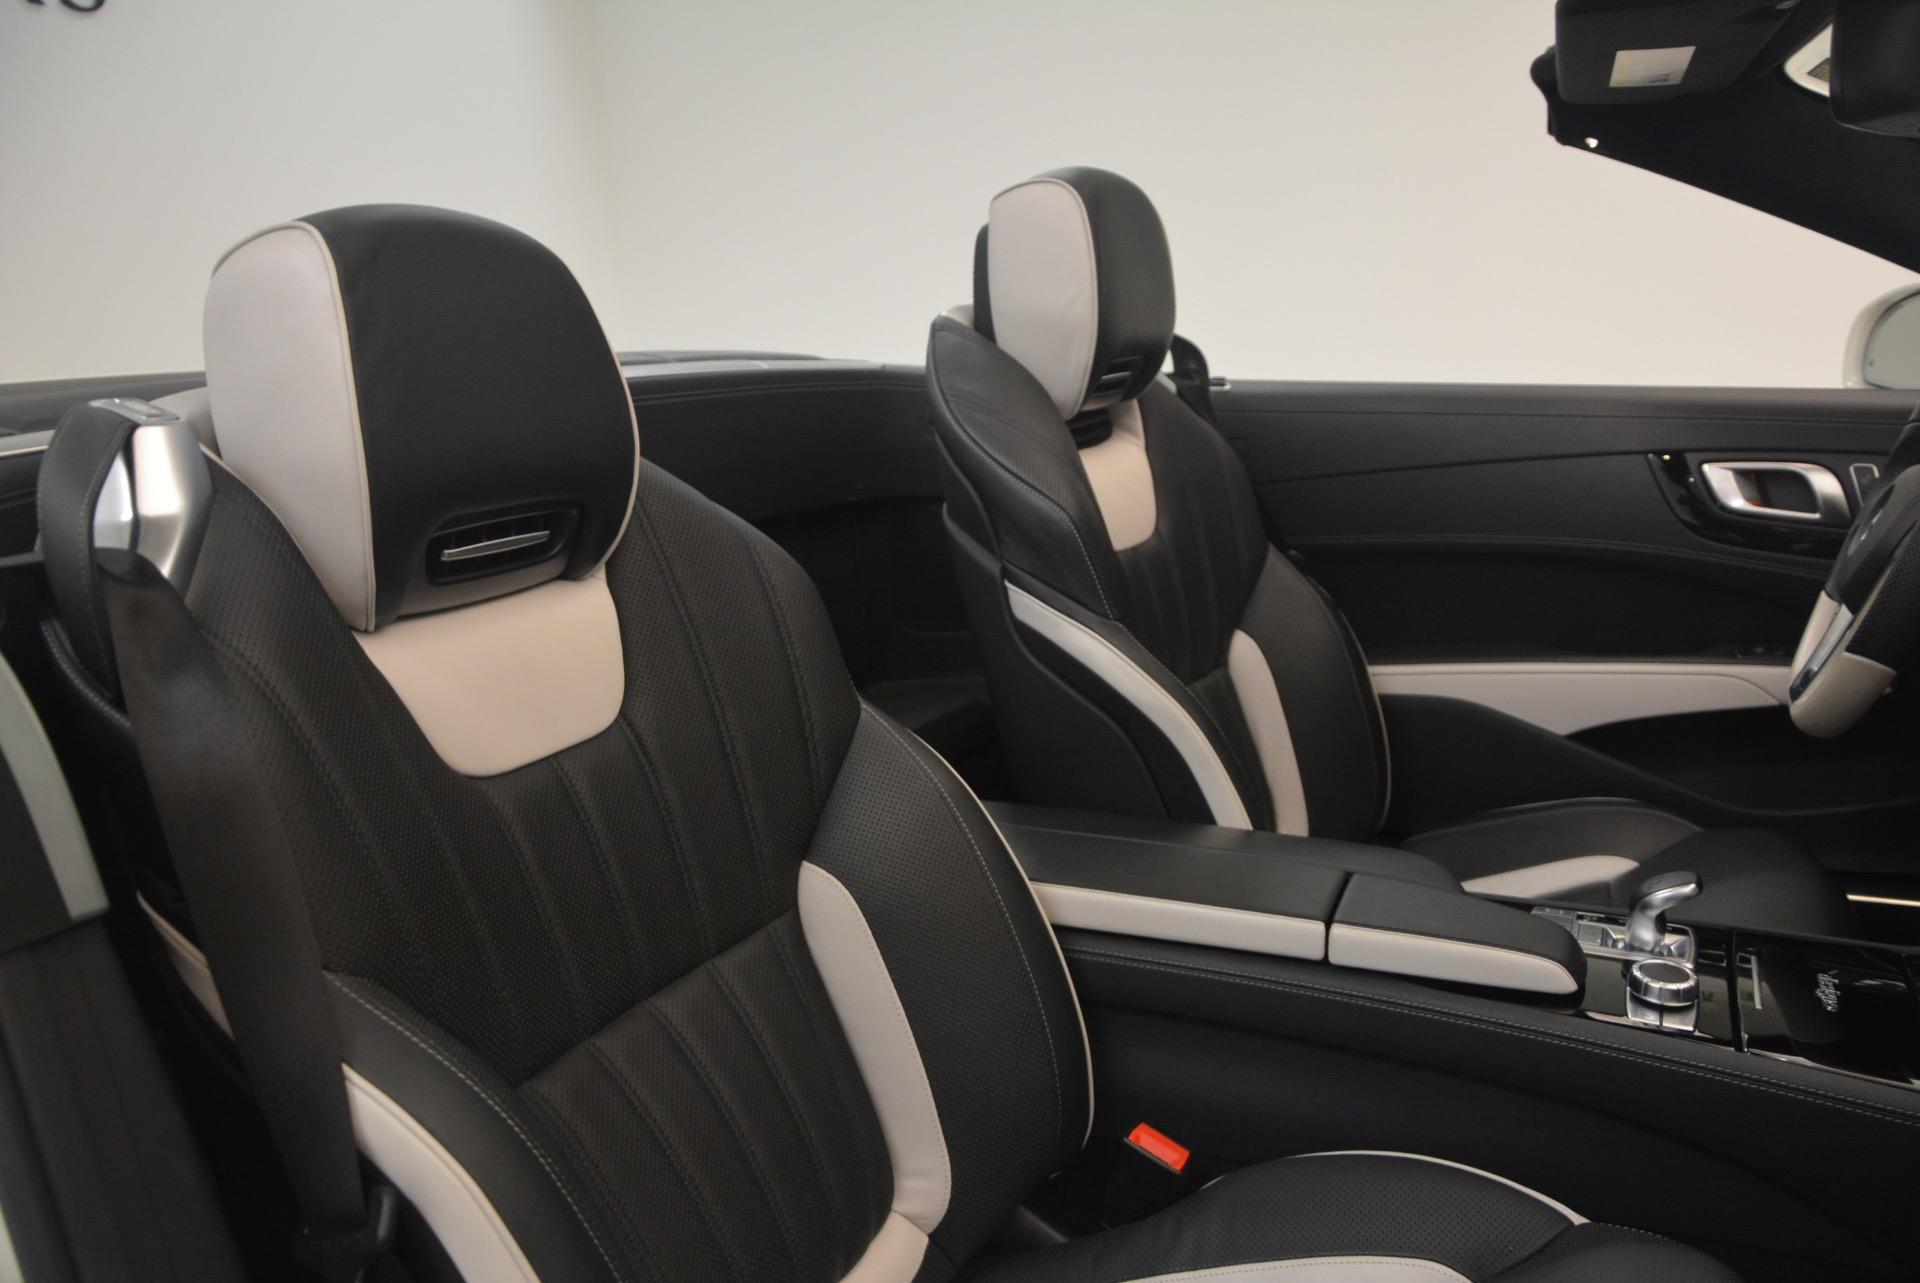 Used 2015 Mercedes Benz SL-Class SL 550 For Sale In Greenwich, CT. Alfa Romeo of Greenwich, M1874A 1261_p44